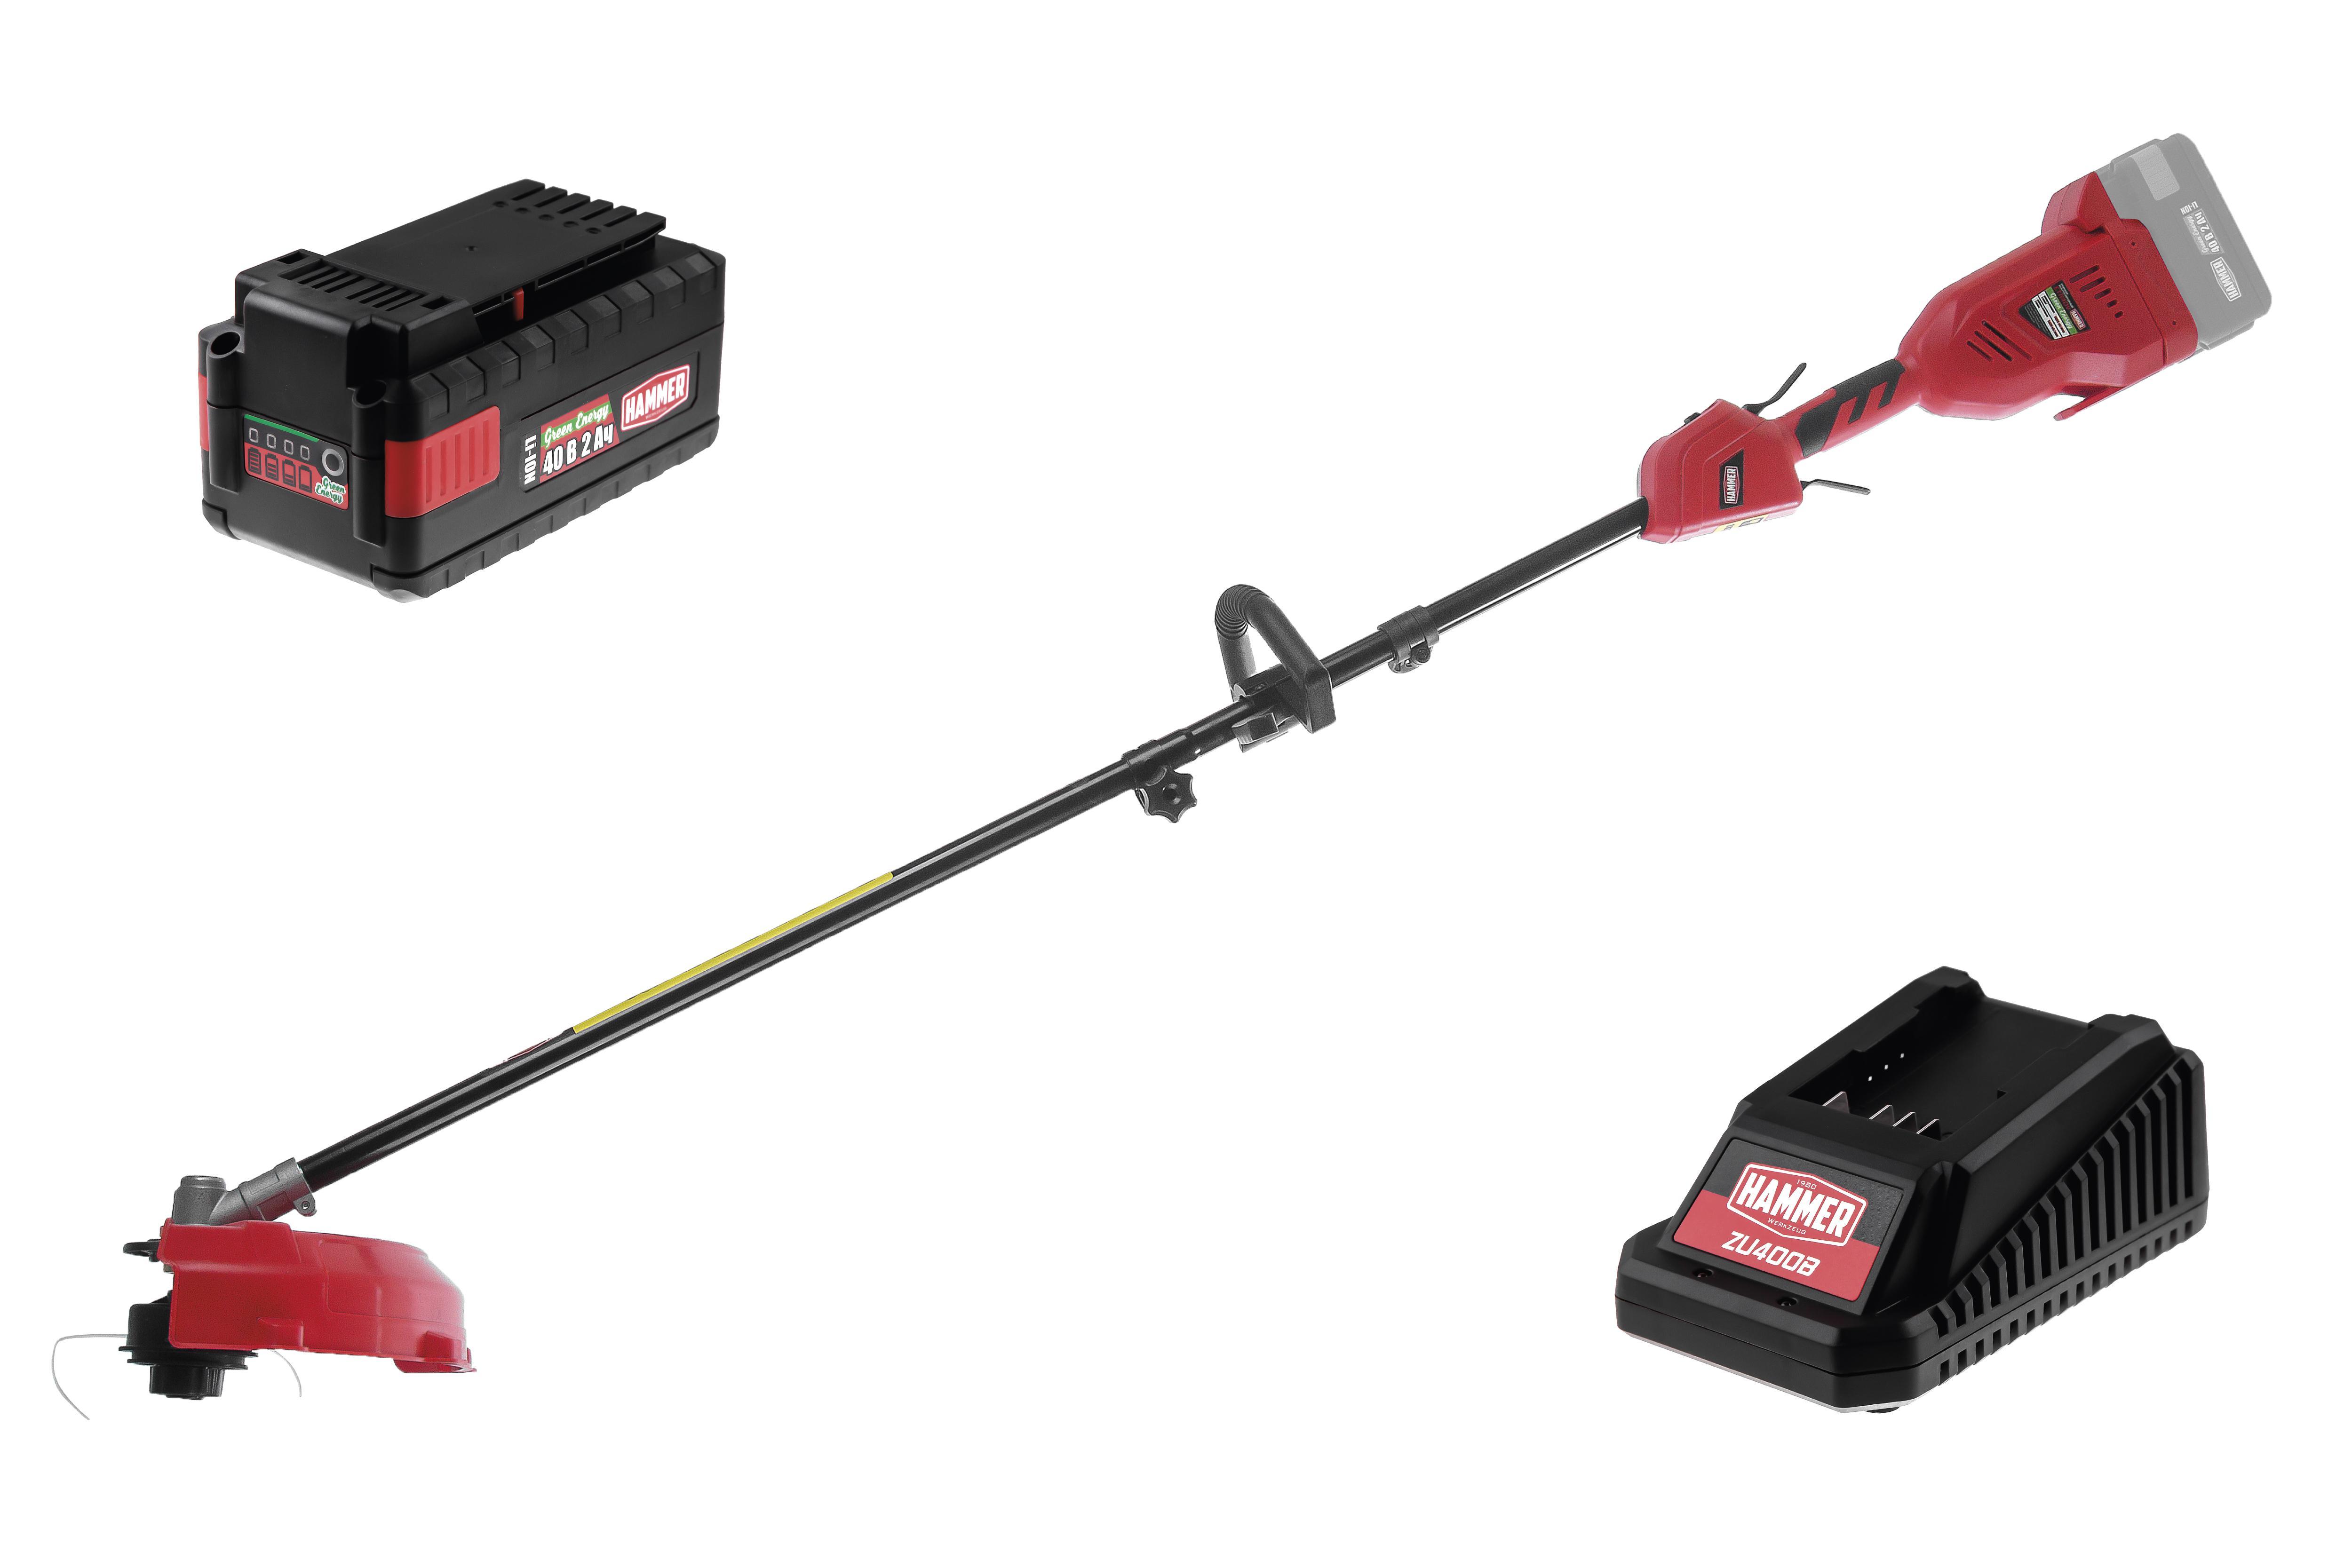 Набор Hammer Триммер аккумуляторный etr40v + Аккумулятор hammer aks42 40b 2Ач + Зарядное устройство hammer zu400b